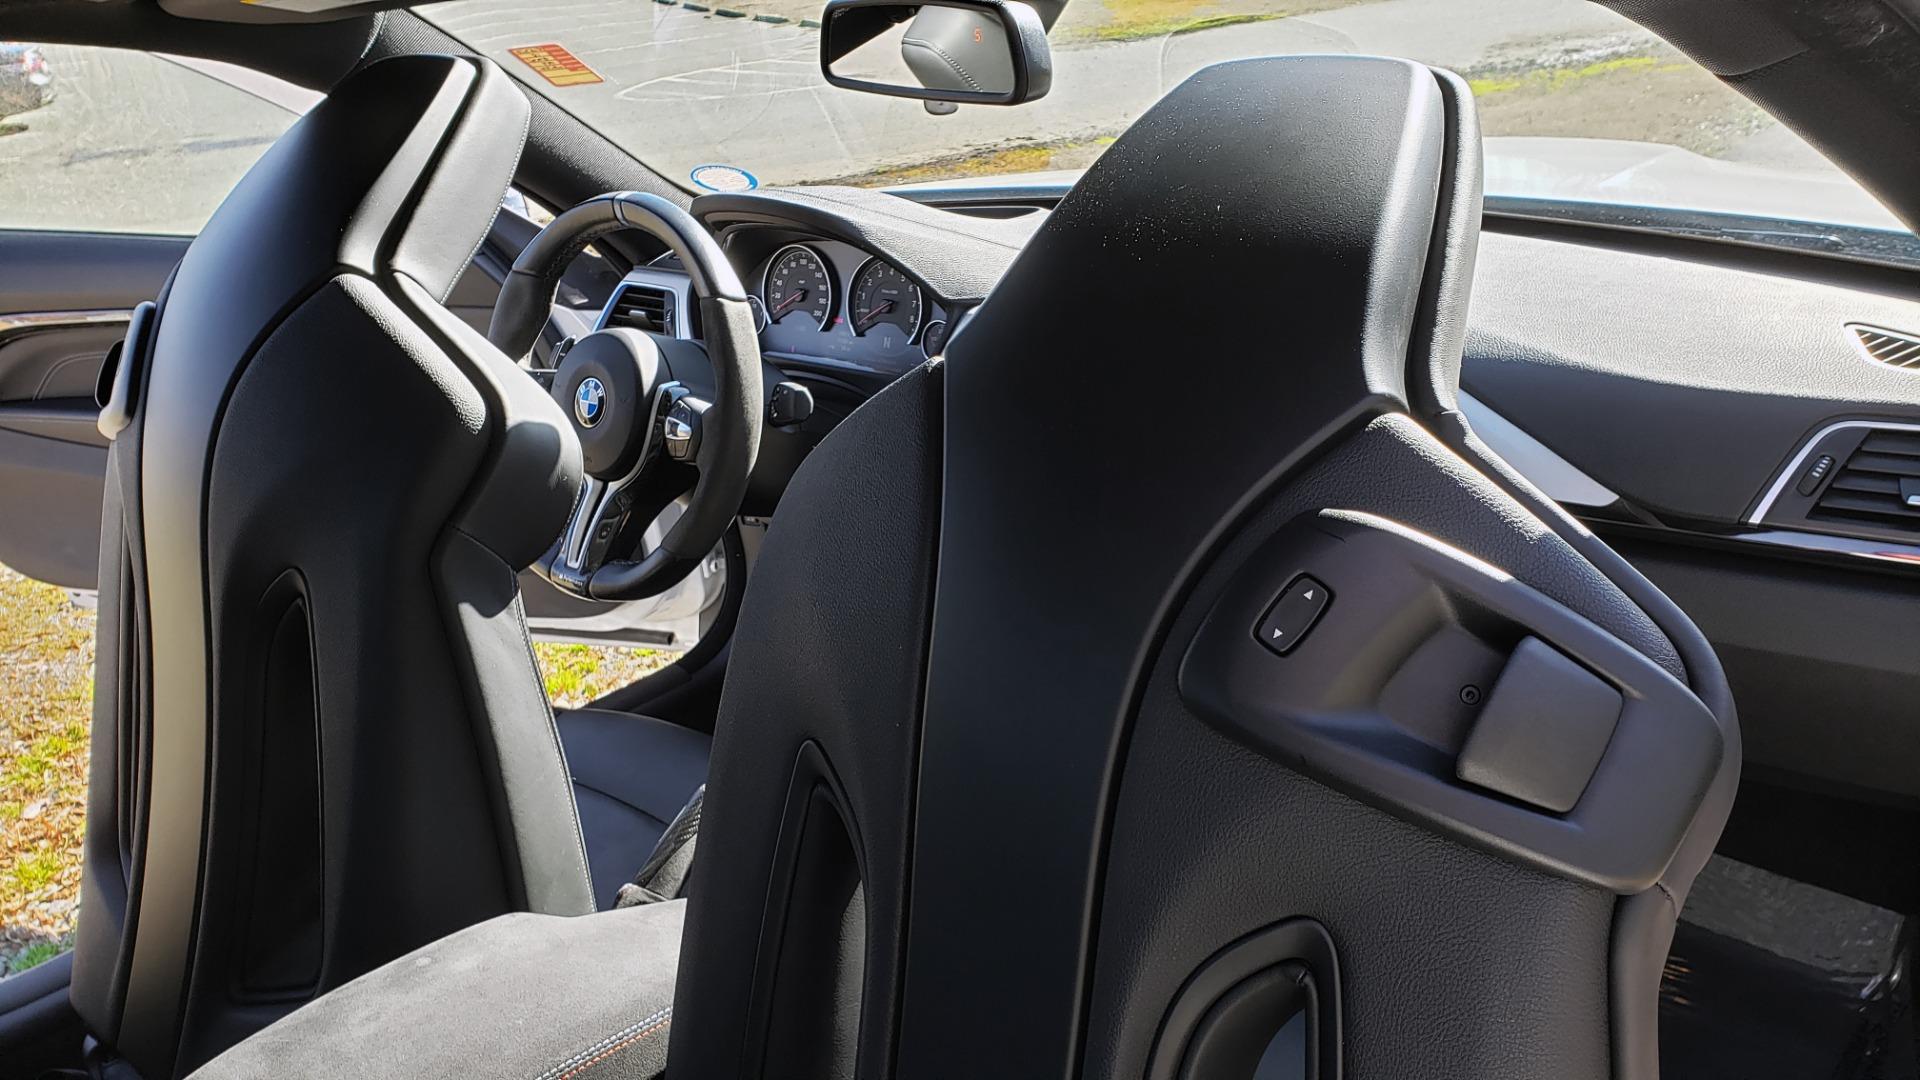 Used 2018 BMW M4 COMP PKG / EXEC / M-DRIVER / PARK CNTRL / ACTIVE BLIND SPOT for sale Sold at Formula Imports in Charlotte NC 28227 62